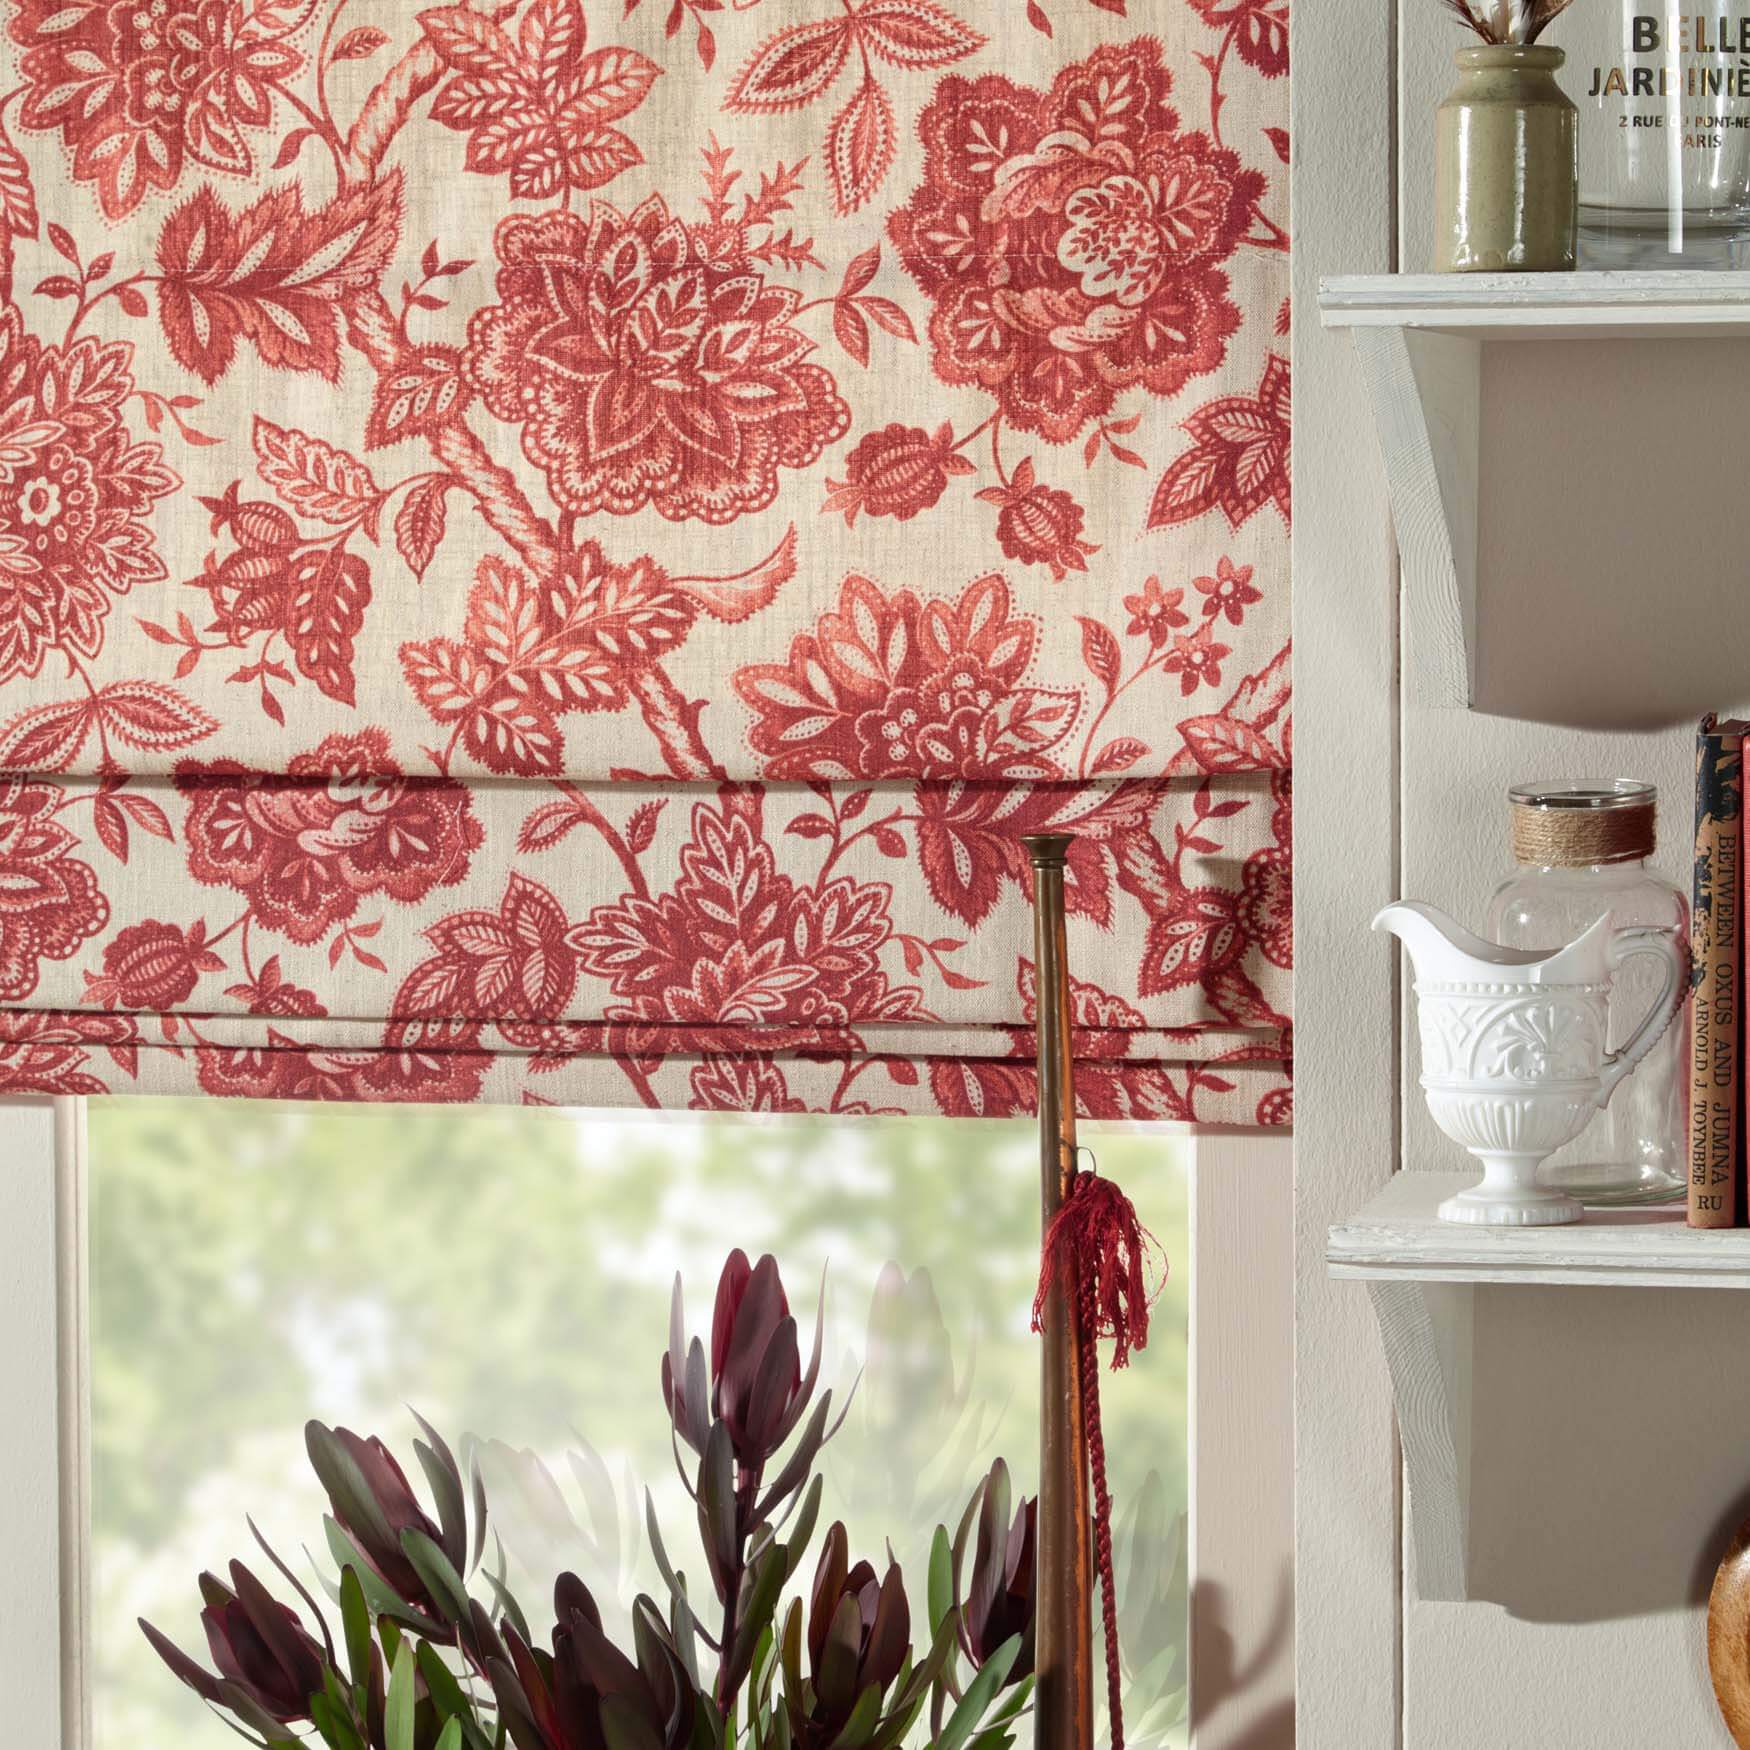 iliv-fabrics-curtains-blinds.jpg